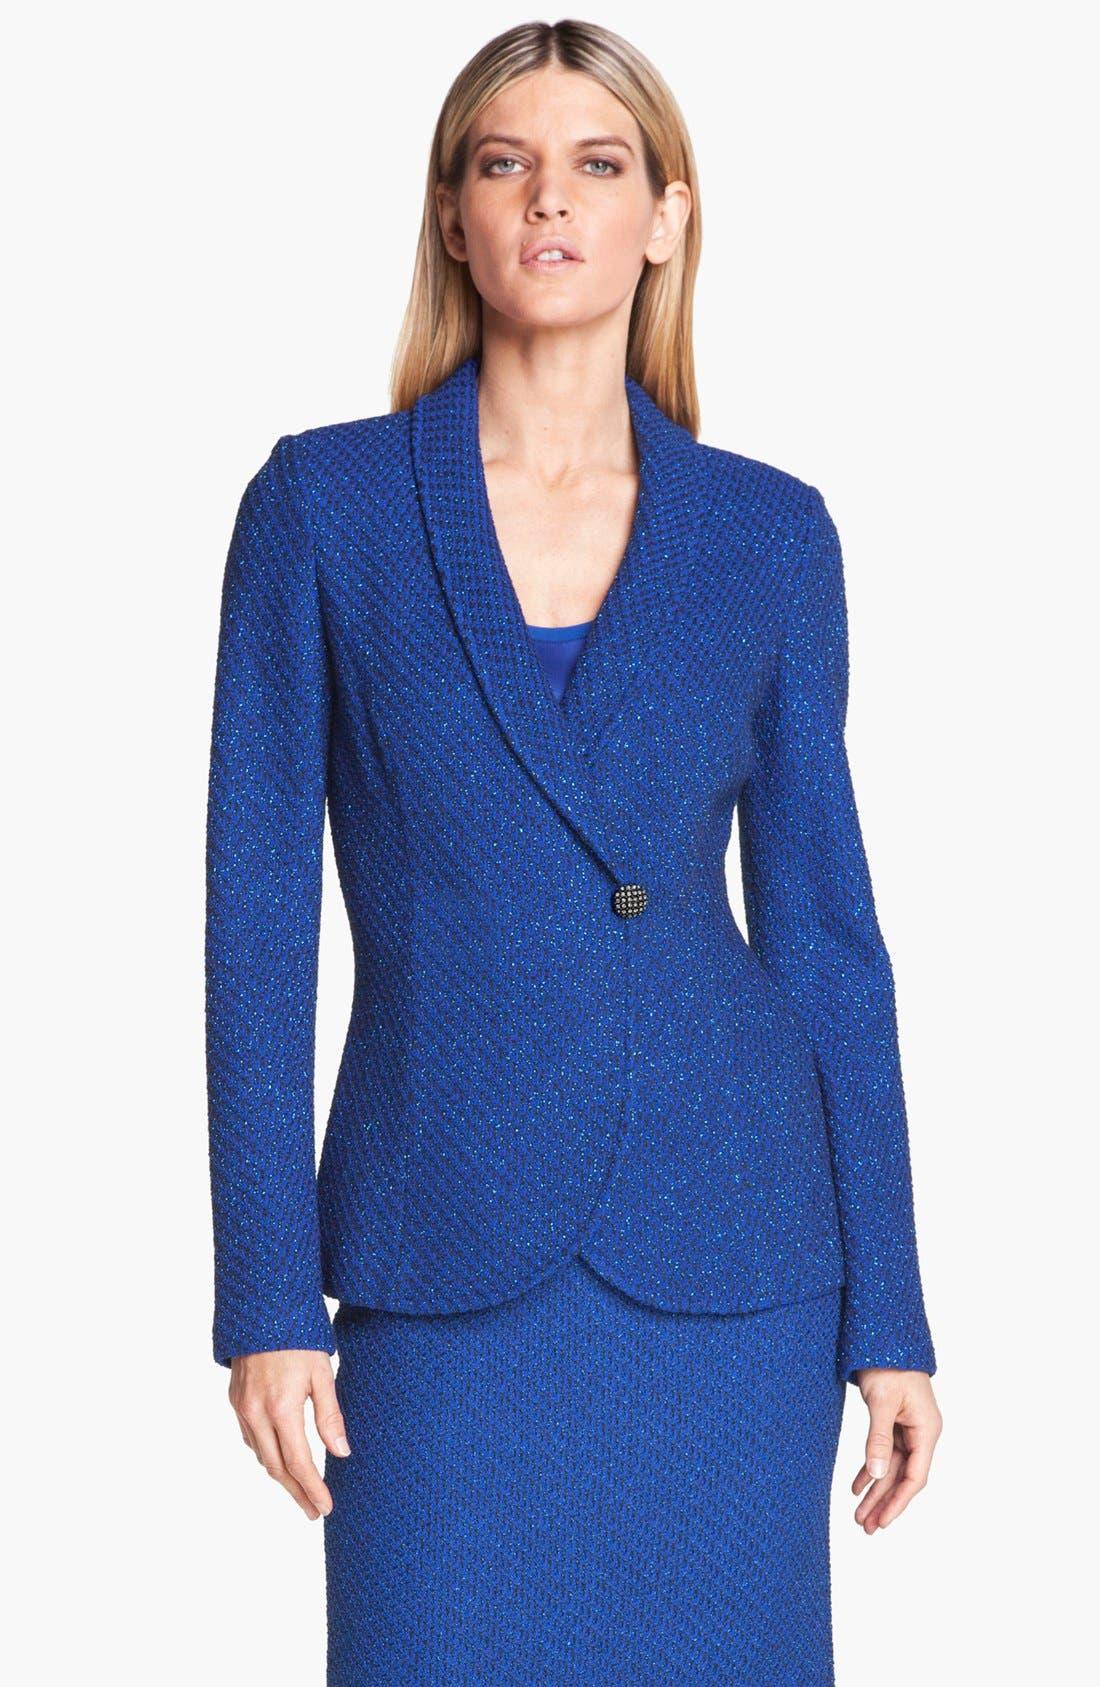 Main Image - St. John Collection Ivy Tweed Jacket